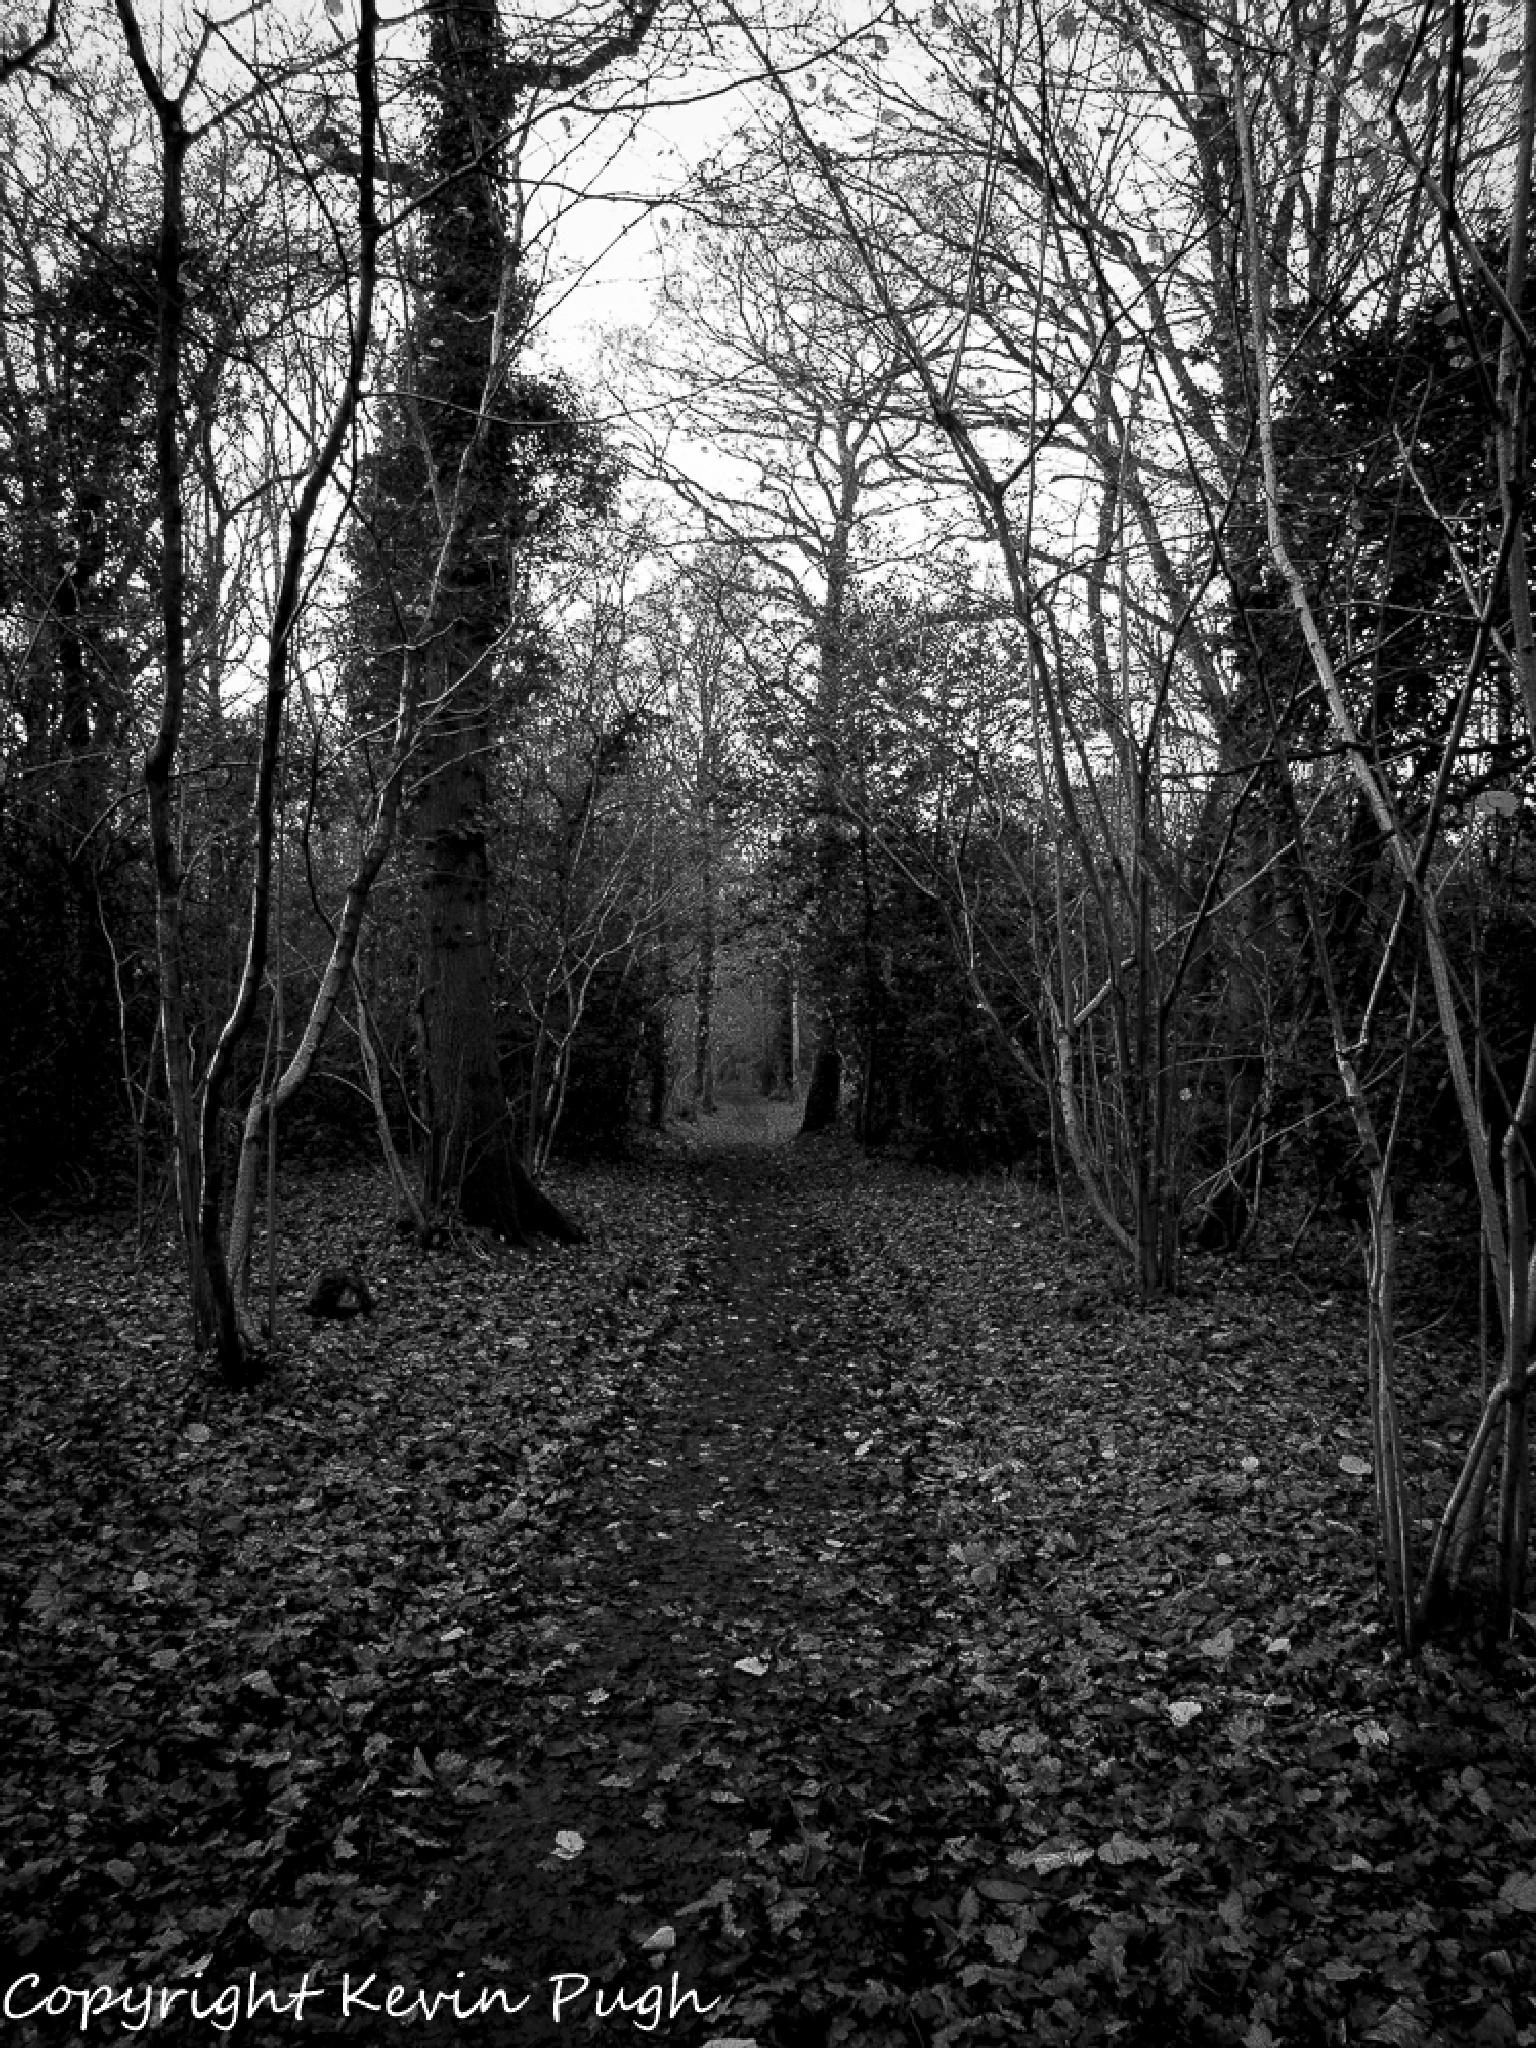 I walk this path alone by kevPugh